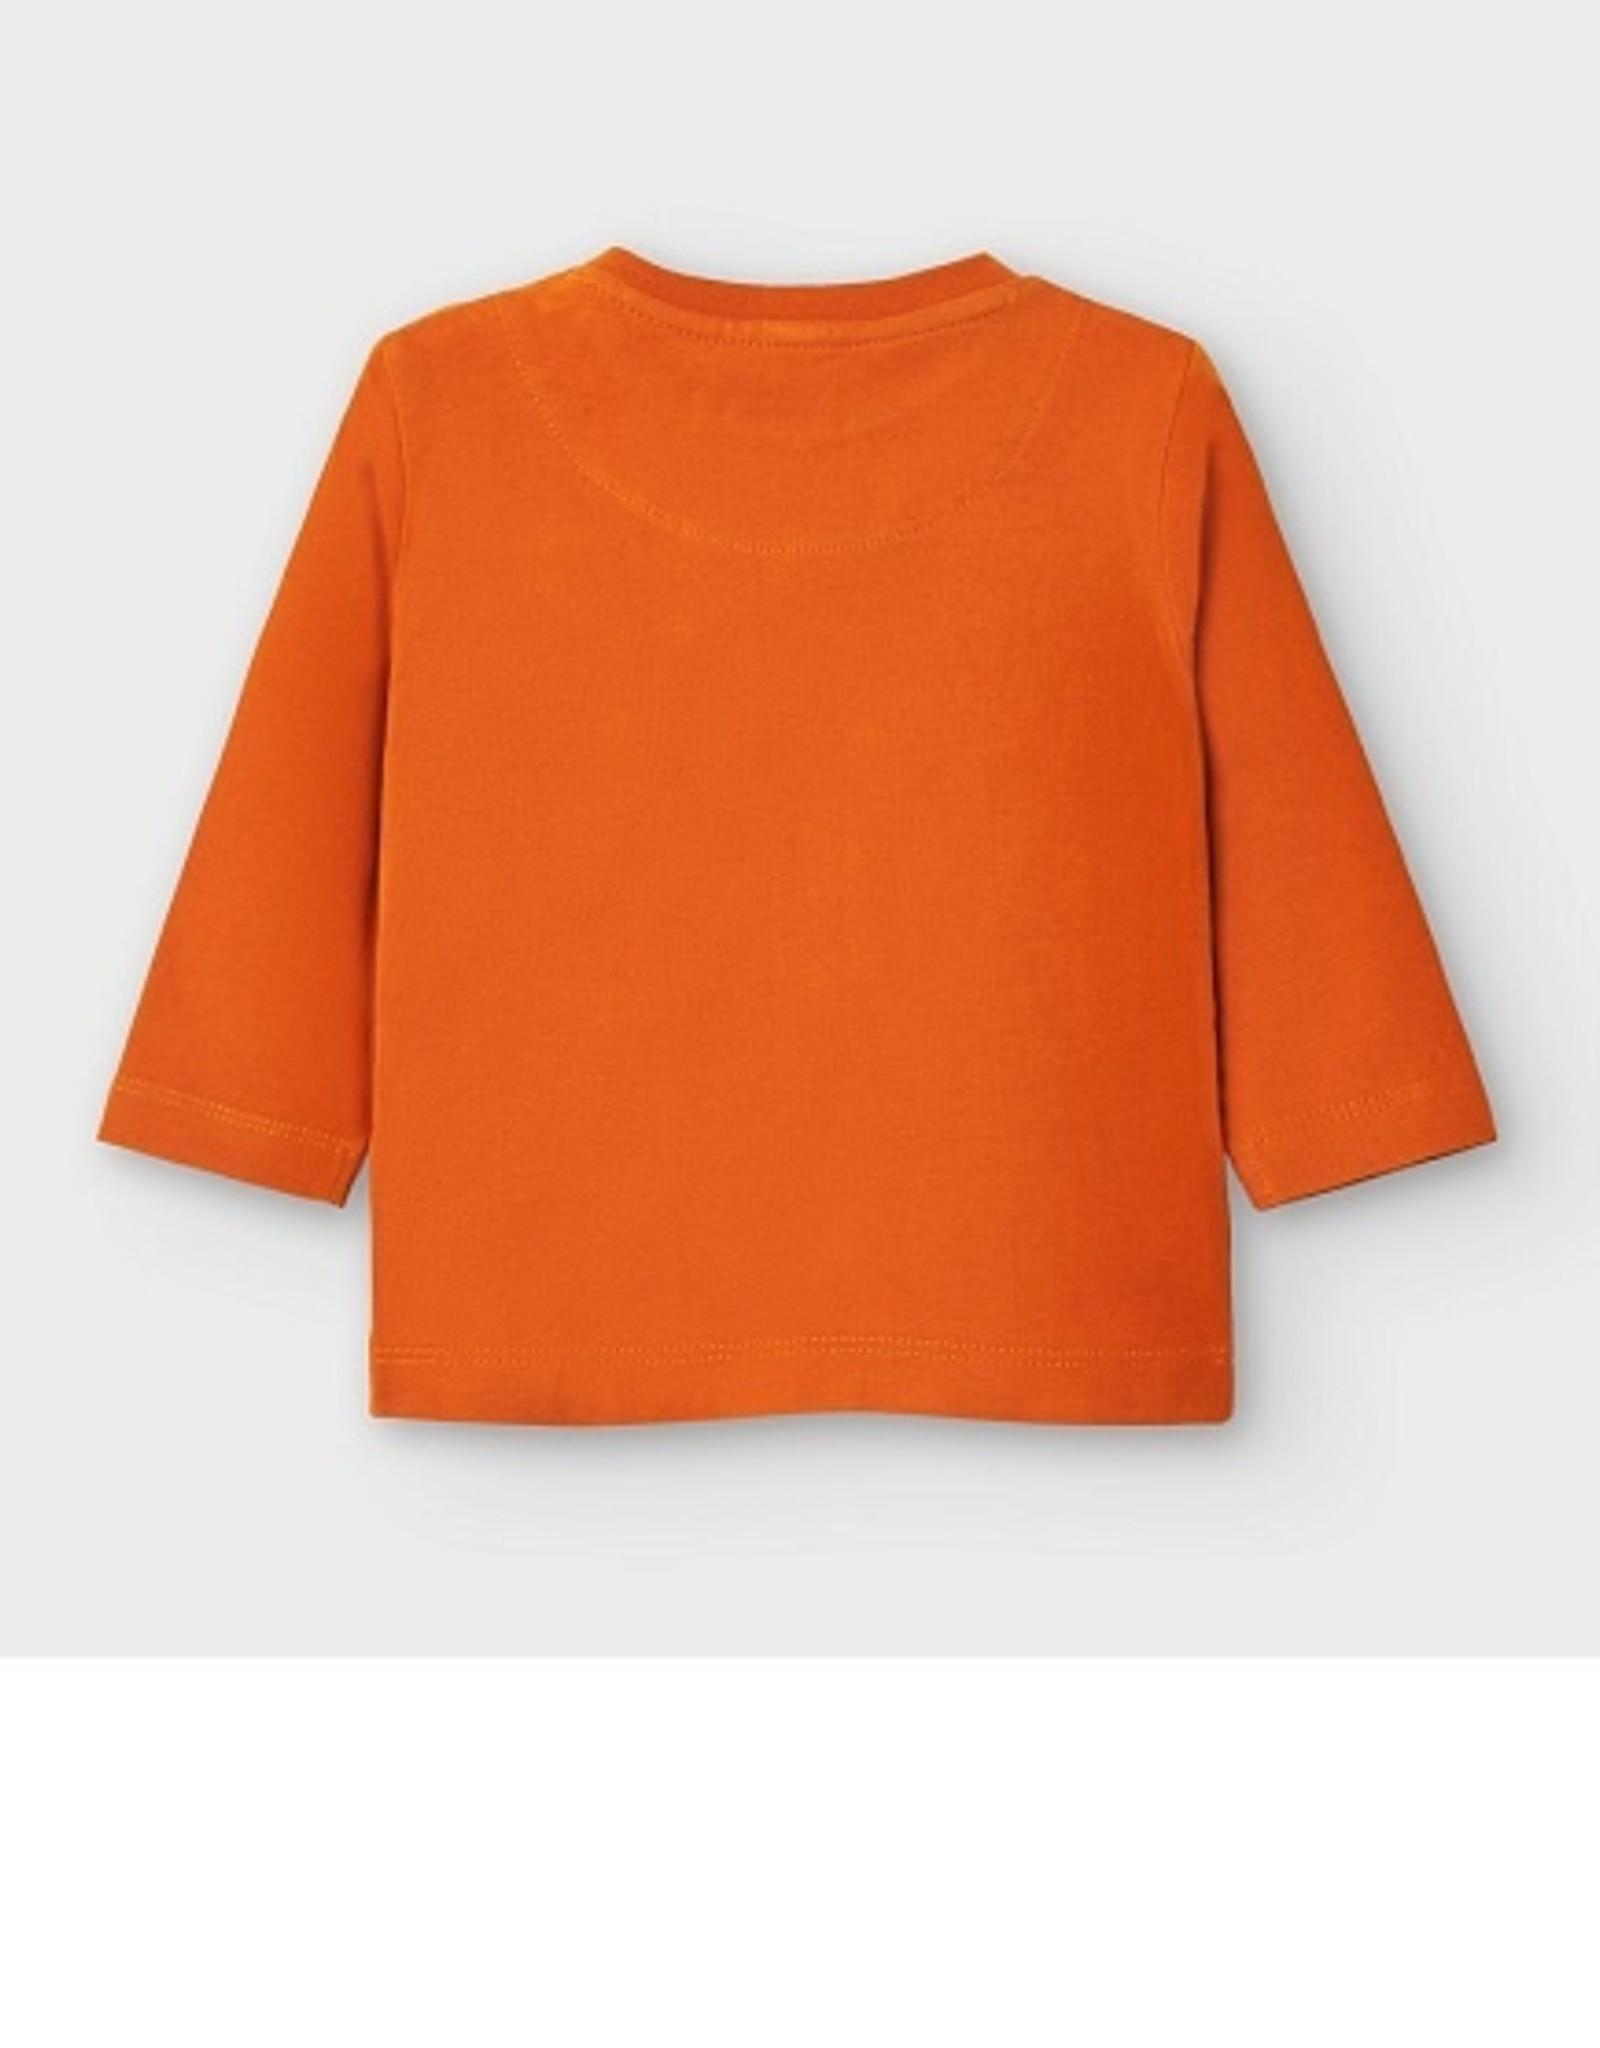 Mayoral  T-shirt do oranje rugzak